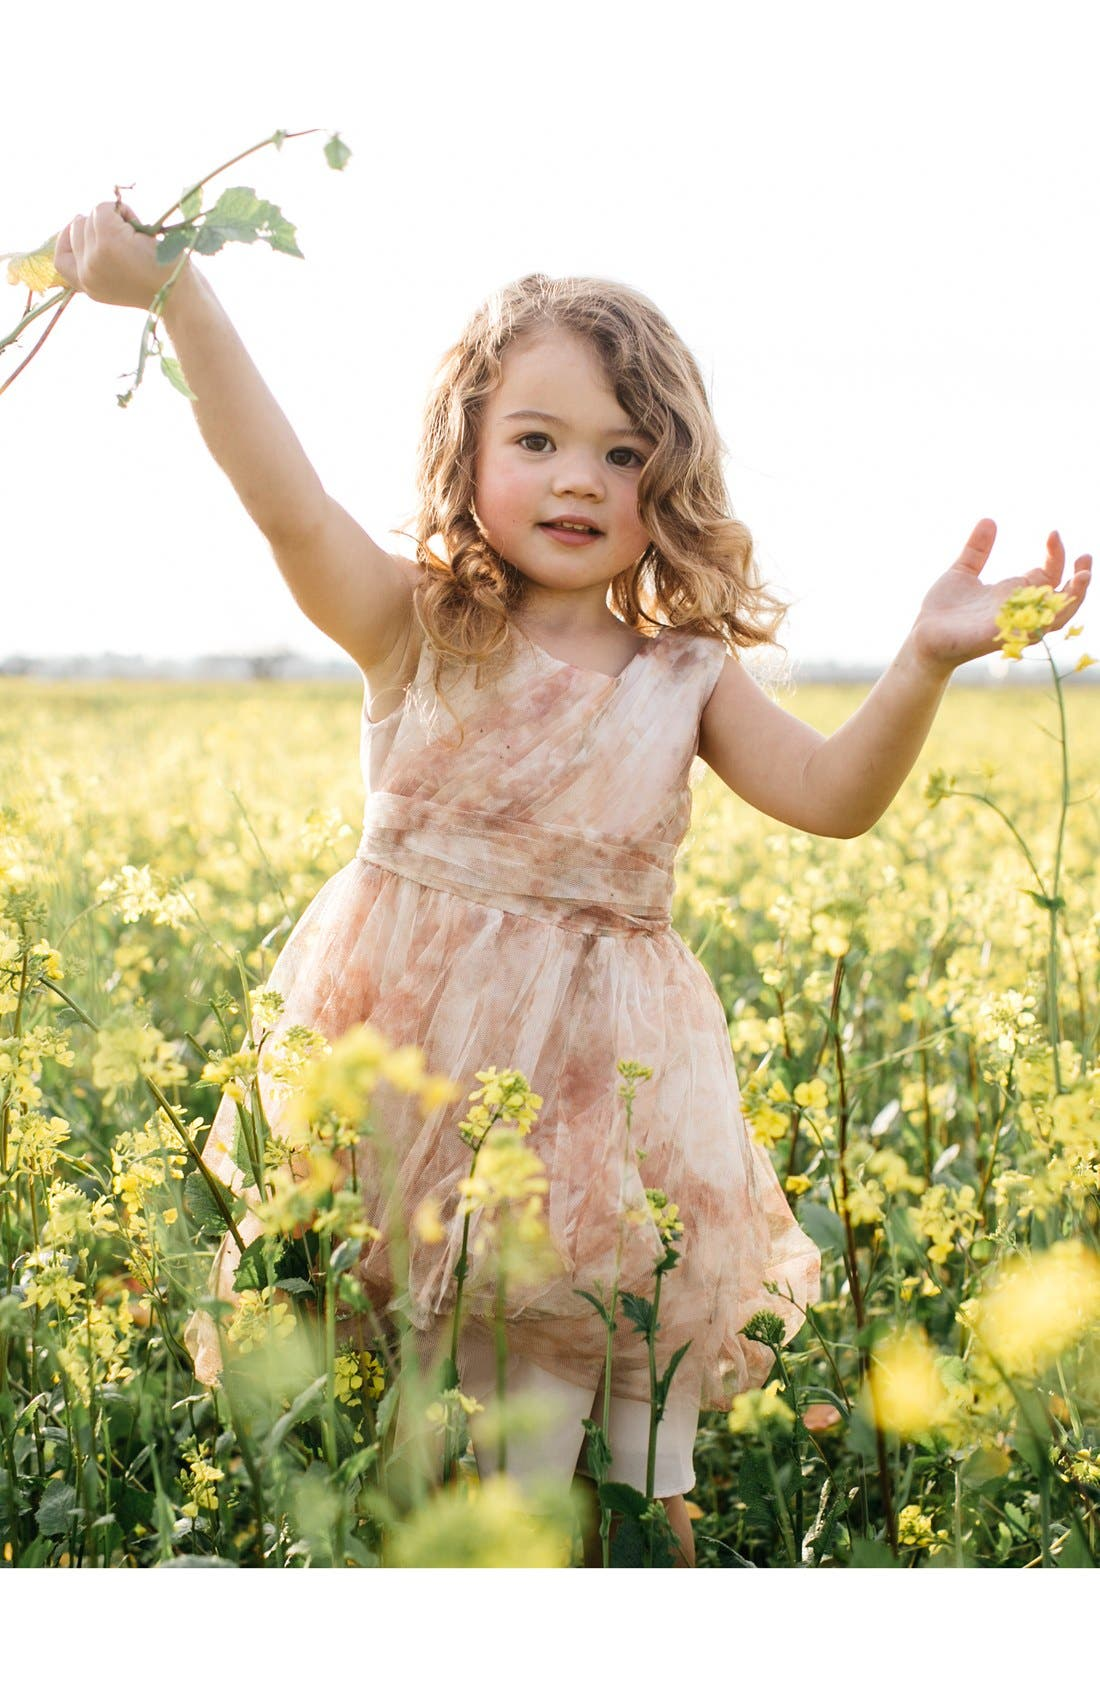 Etsy - Vintage Floral Tulle Dress,                             Alternate thumbnail 6, color,                             Blush Multi